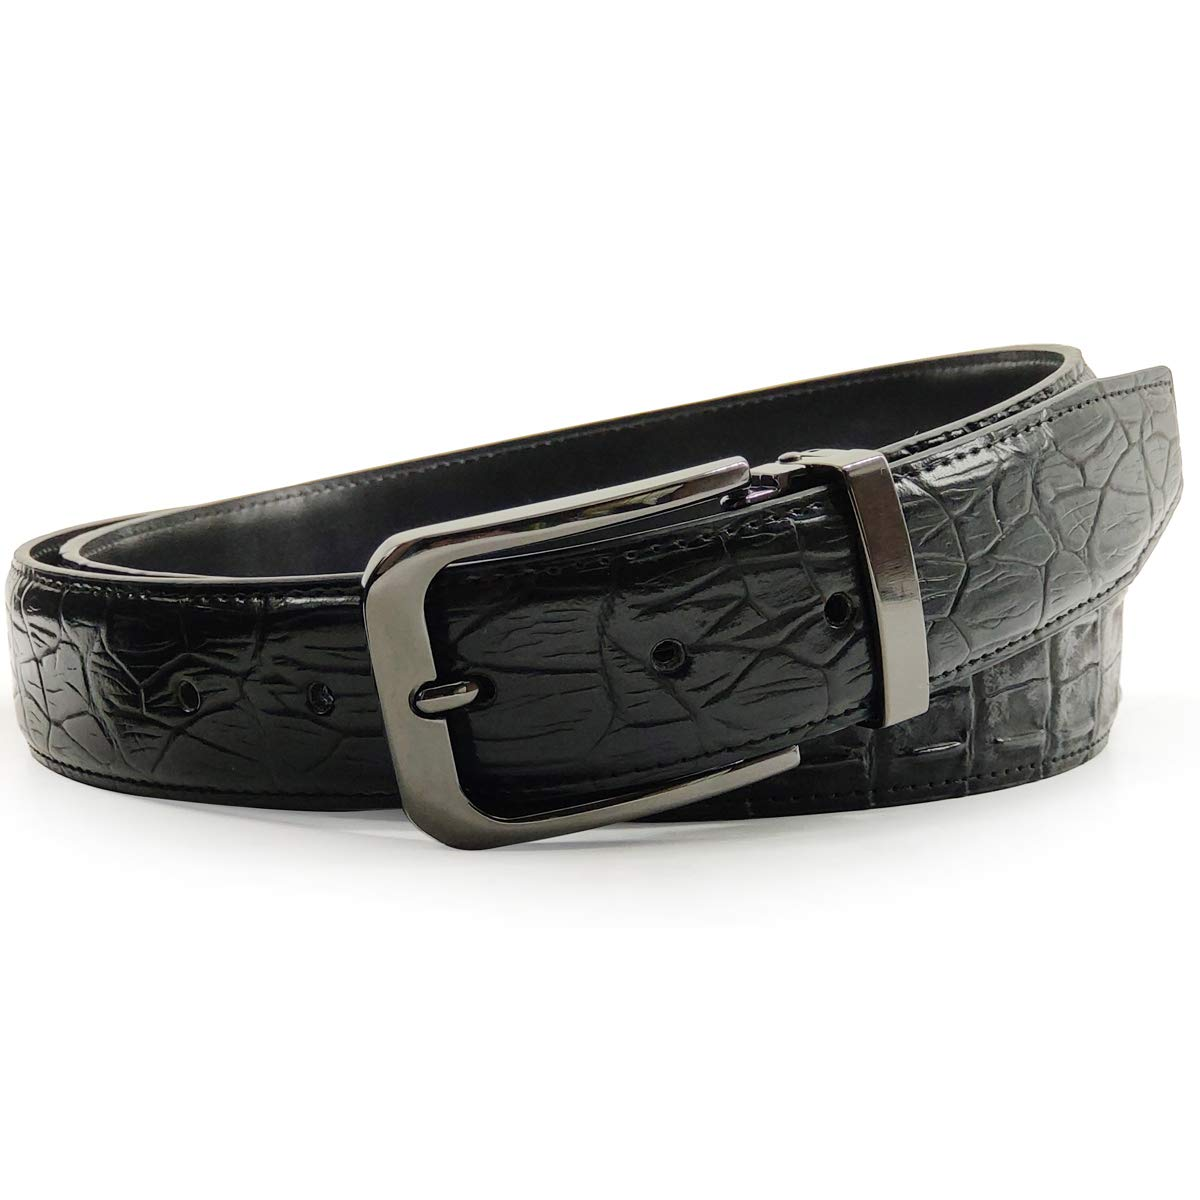 Hoanan Belt for Men Leather